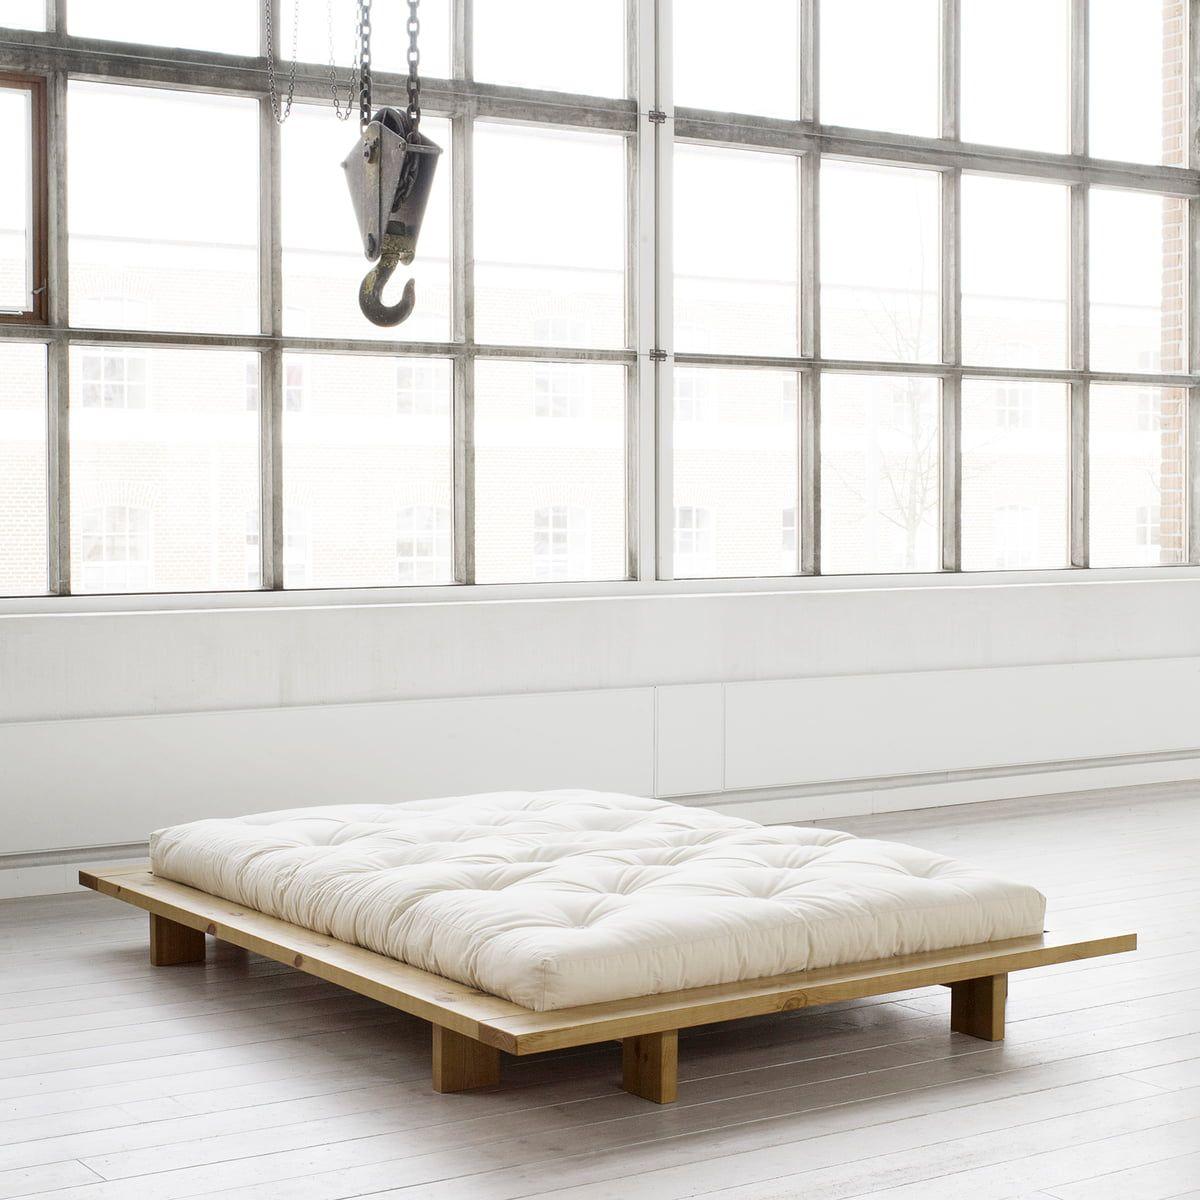 Karup Design Japan Bett 140 x 200 cm, Kiefer natur